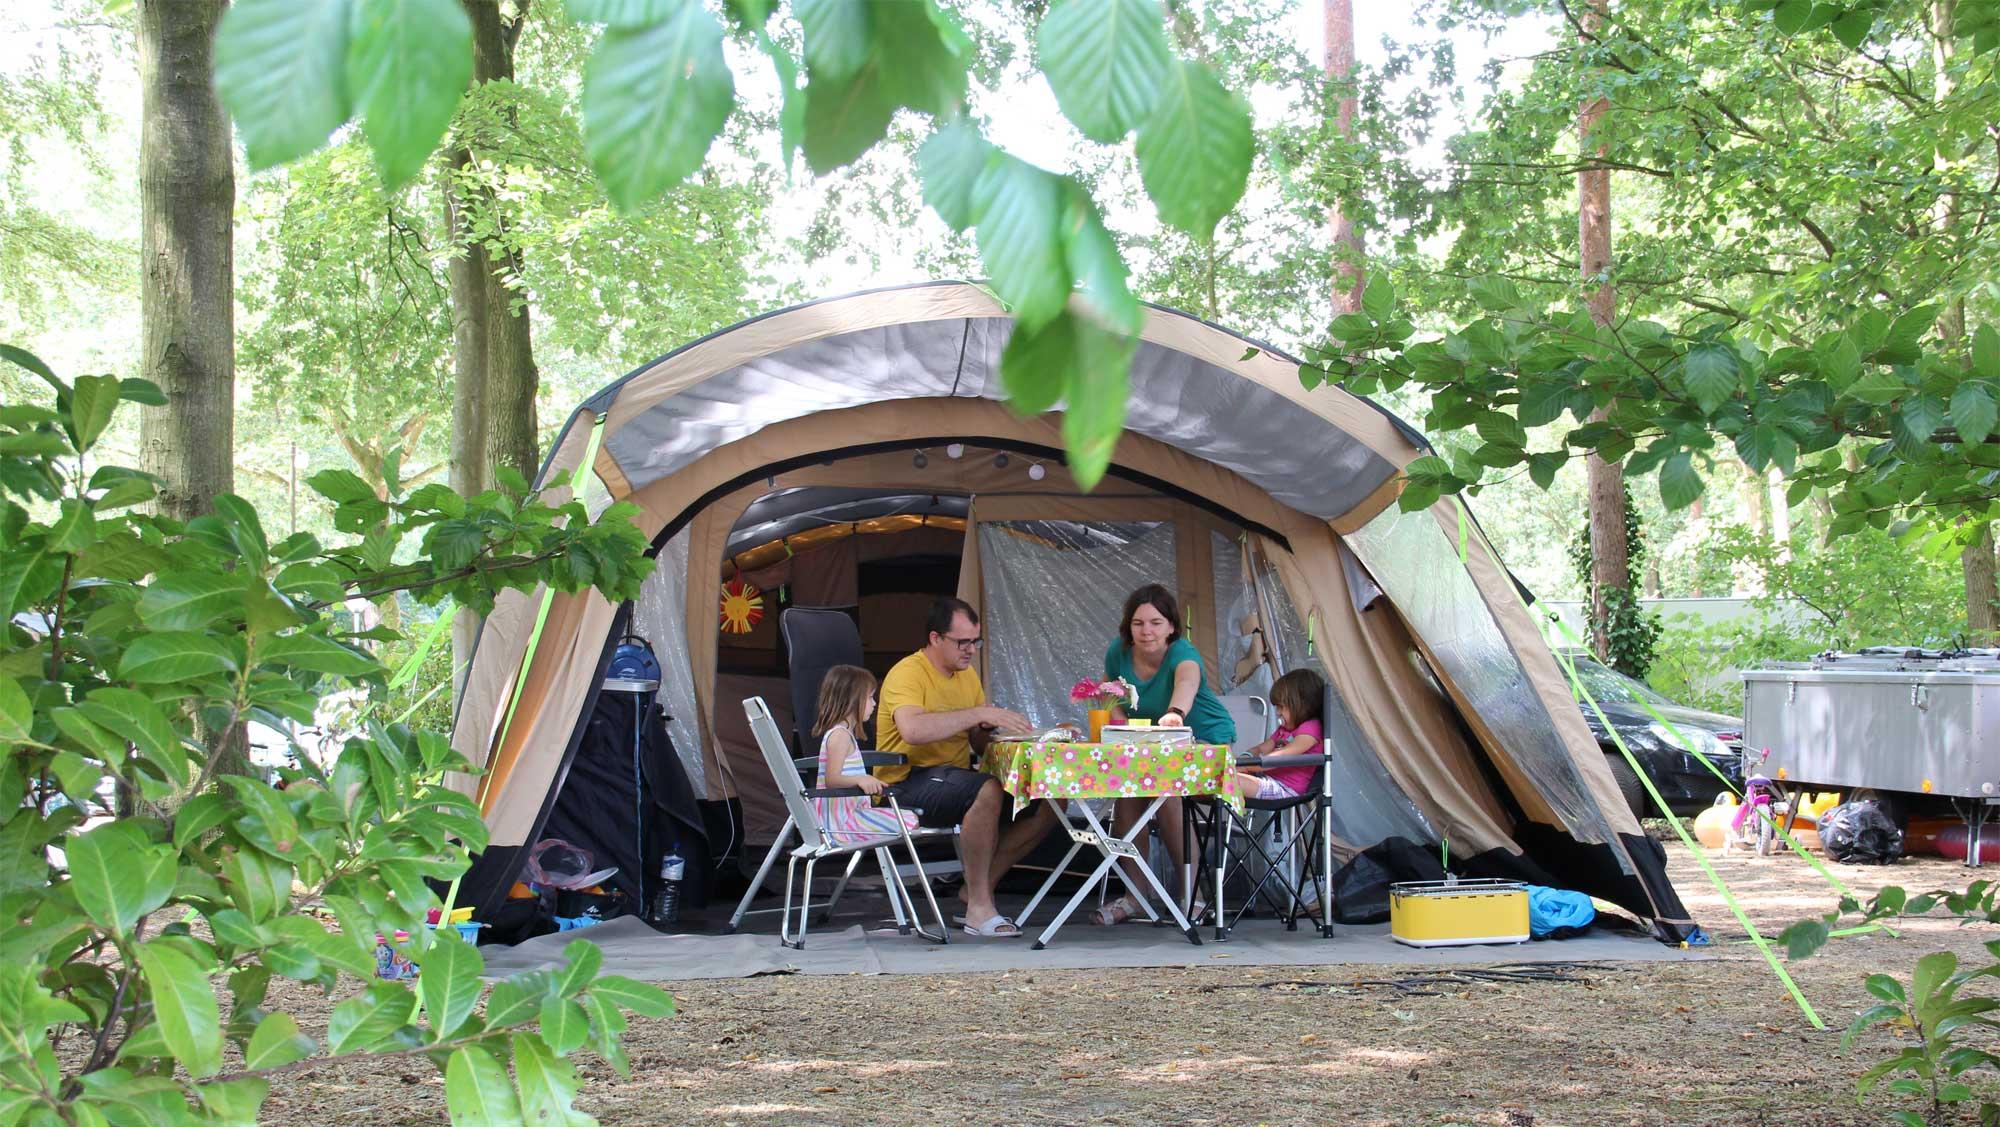 Molecaten Park Bosbad Hoeven 08 kamperen